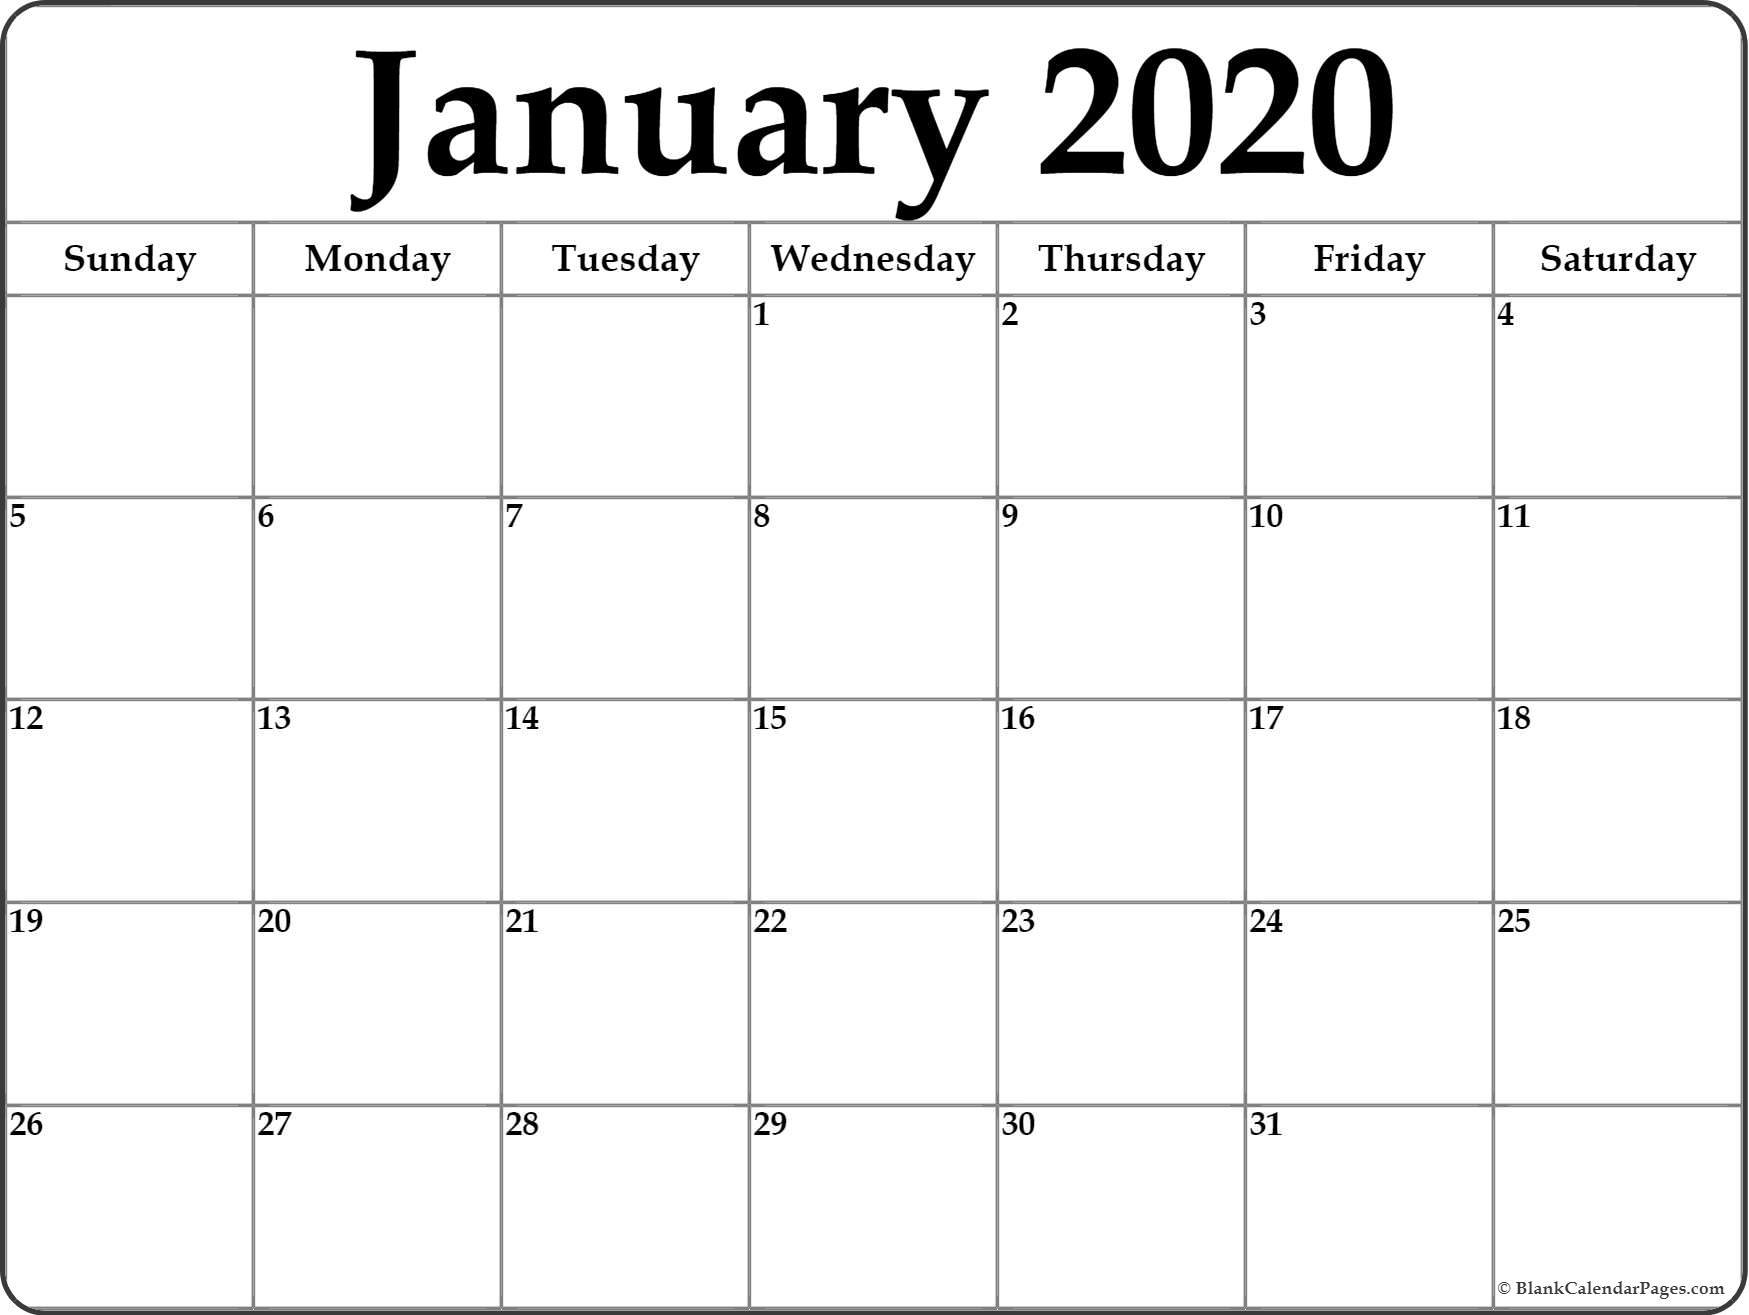 January Blank Calendar 2020  Bolan.horizonconsulting.co regarding Blank Calendar 2020 Printable